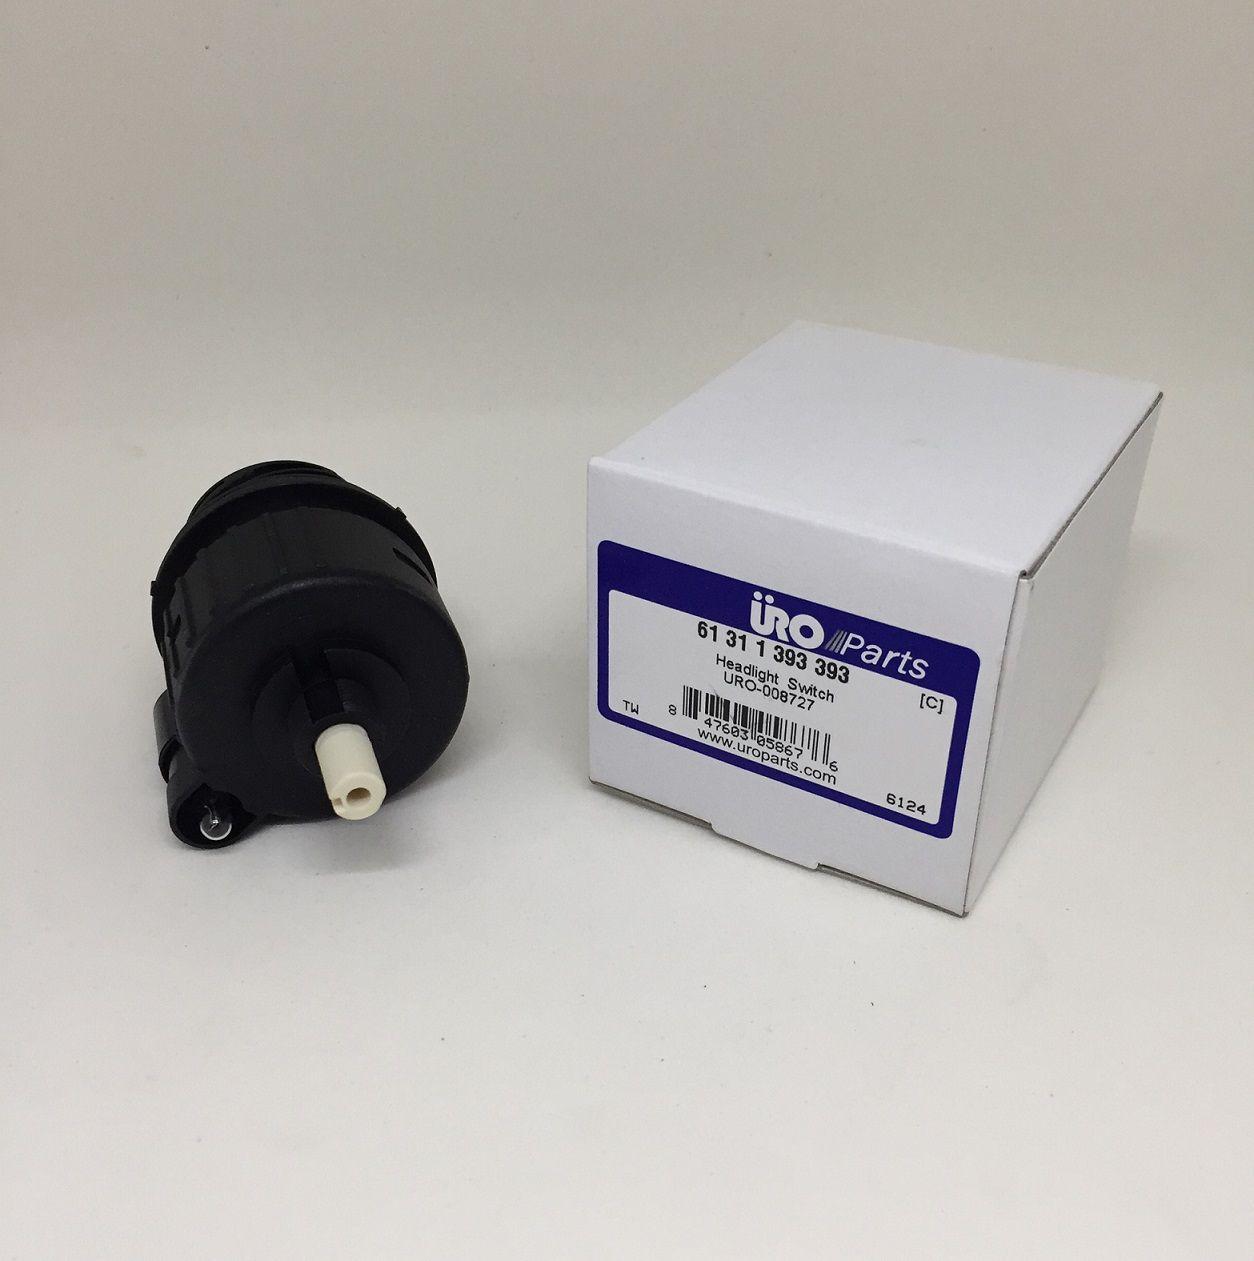 URO Parts 61 31 1 393 393 Headlight Switch